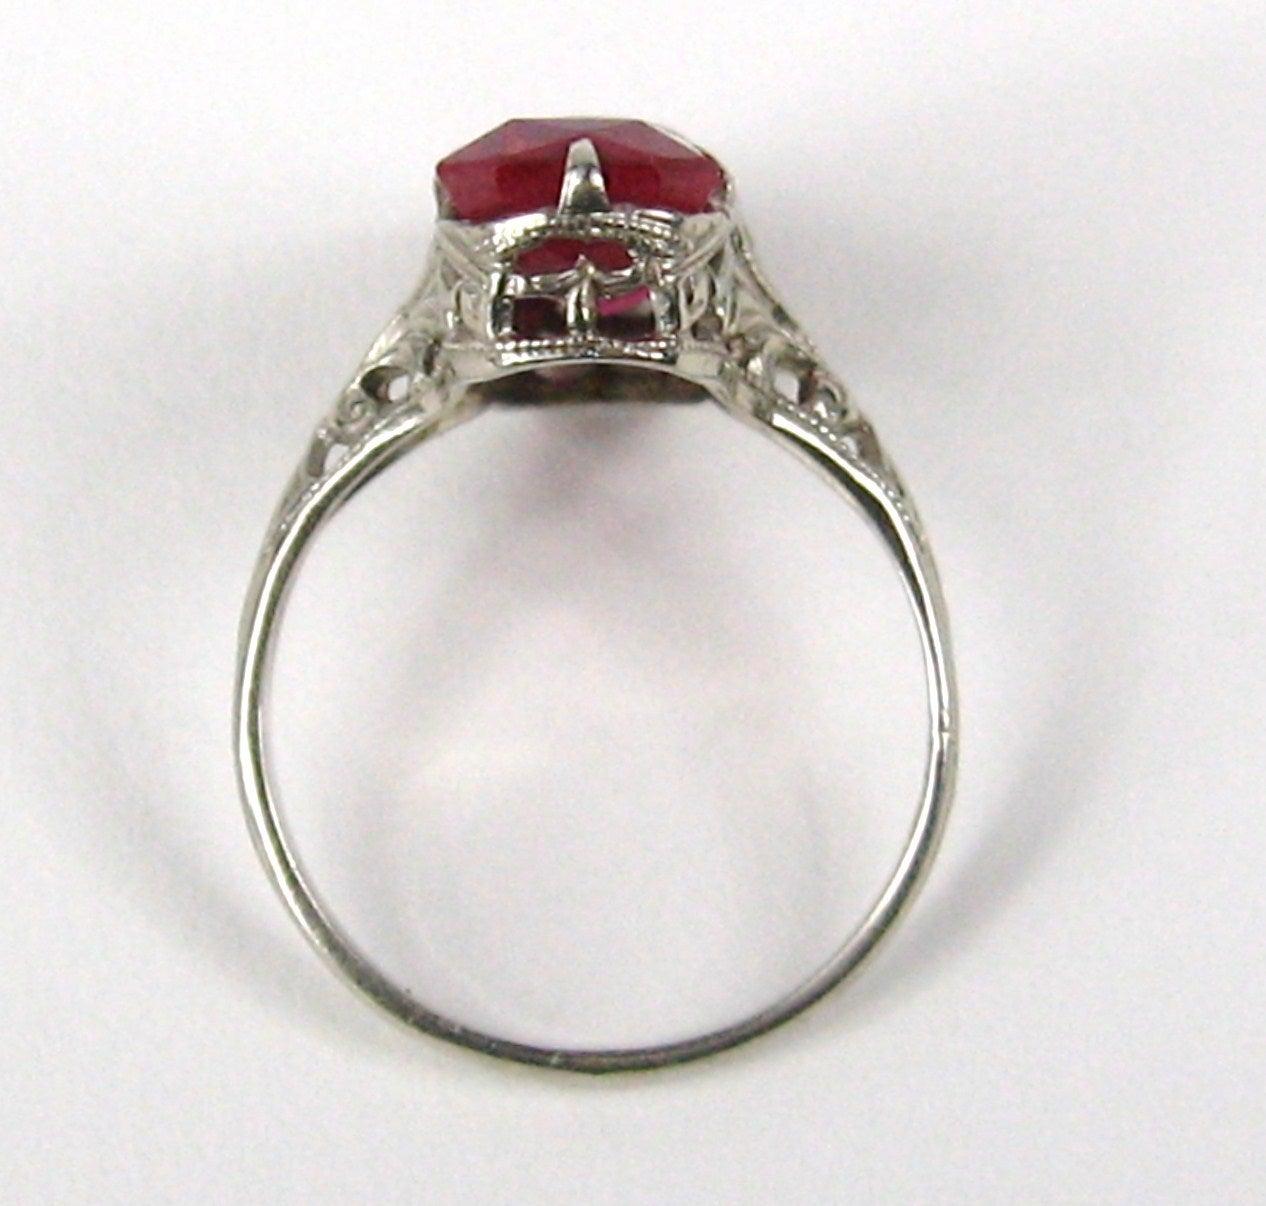 1920s white gold filigree ring at 1stdibs